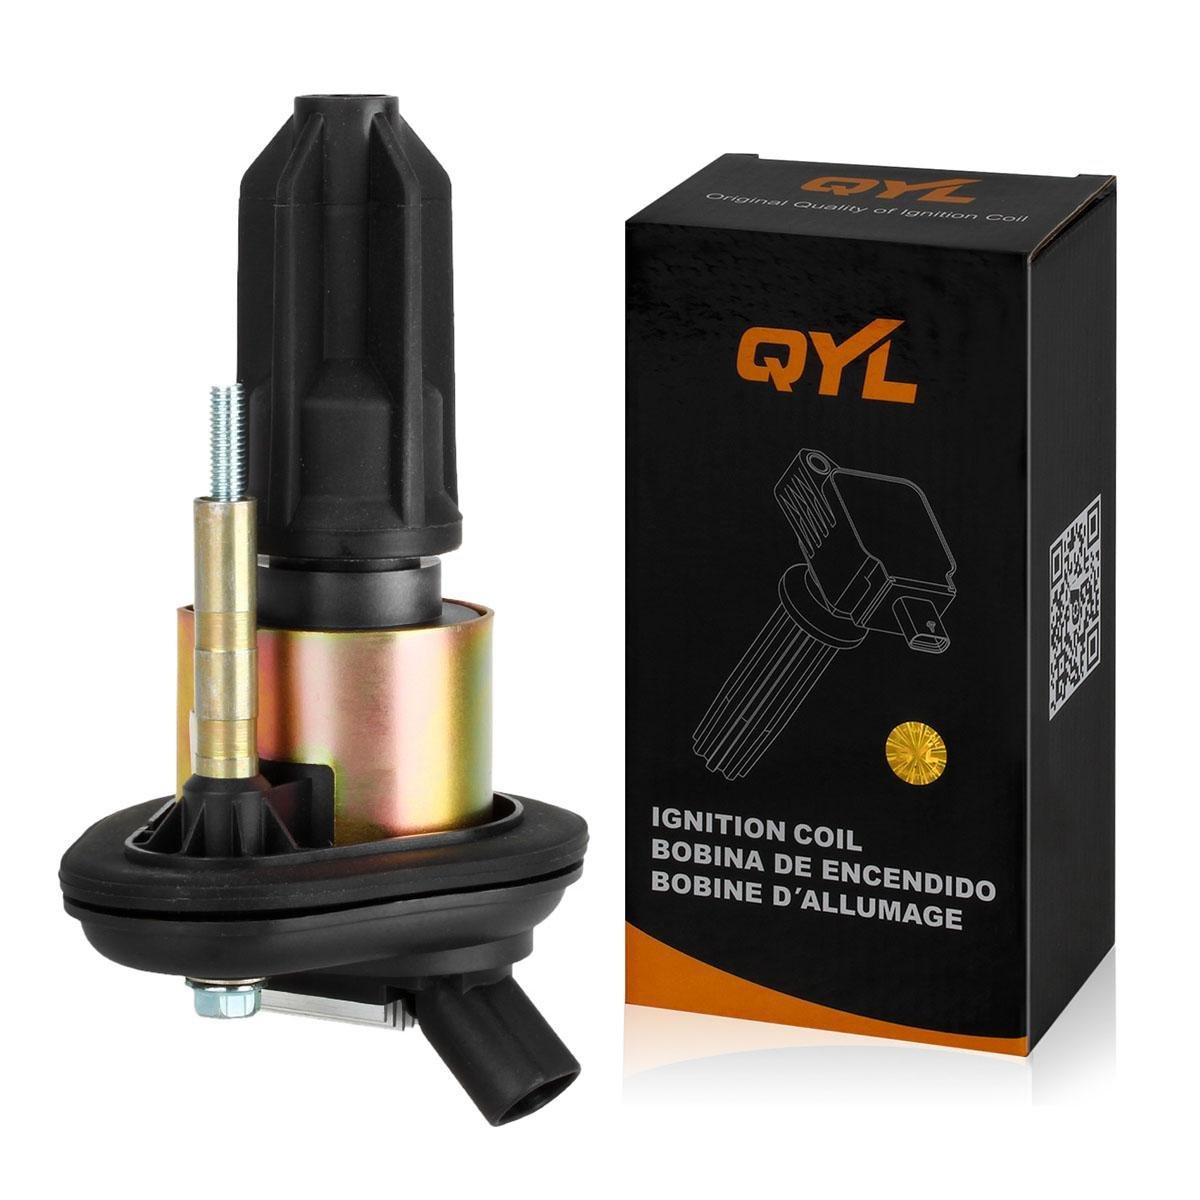 QYL Ignition coil for Chevy GMC Saab Isuzu 2.8L 2.9L 3.5L 3.7L 4.2L I4 I5 I6 UF303 5C1392 GN10114 5C1723 C1395 C1666 610-00109 UF-303(Pack of 1) by QYL